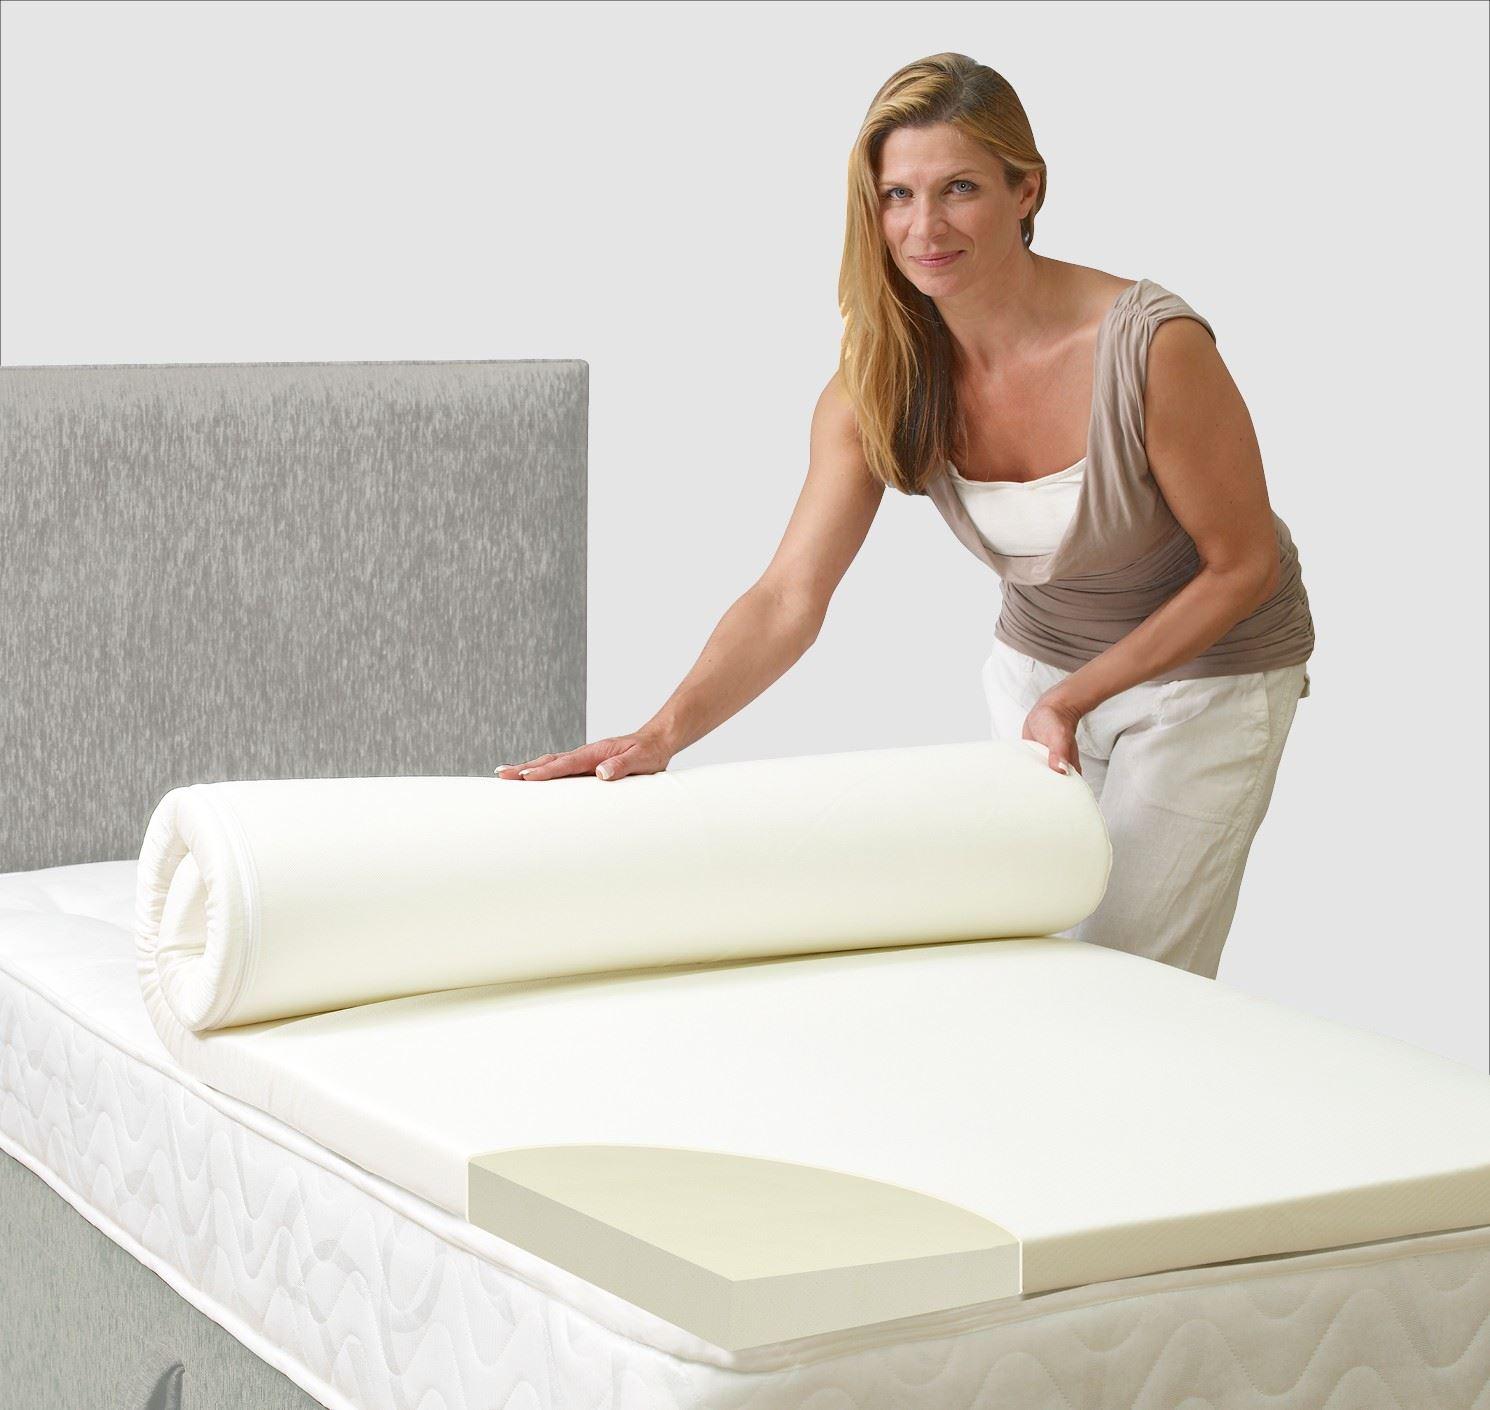 memory foam visco mattress topper king uk new offer ebay. Black Bedroom Furniture Sets. Home Design Ideas